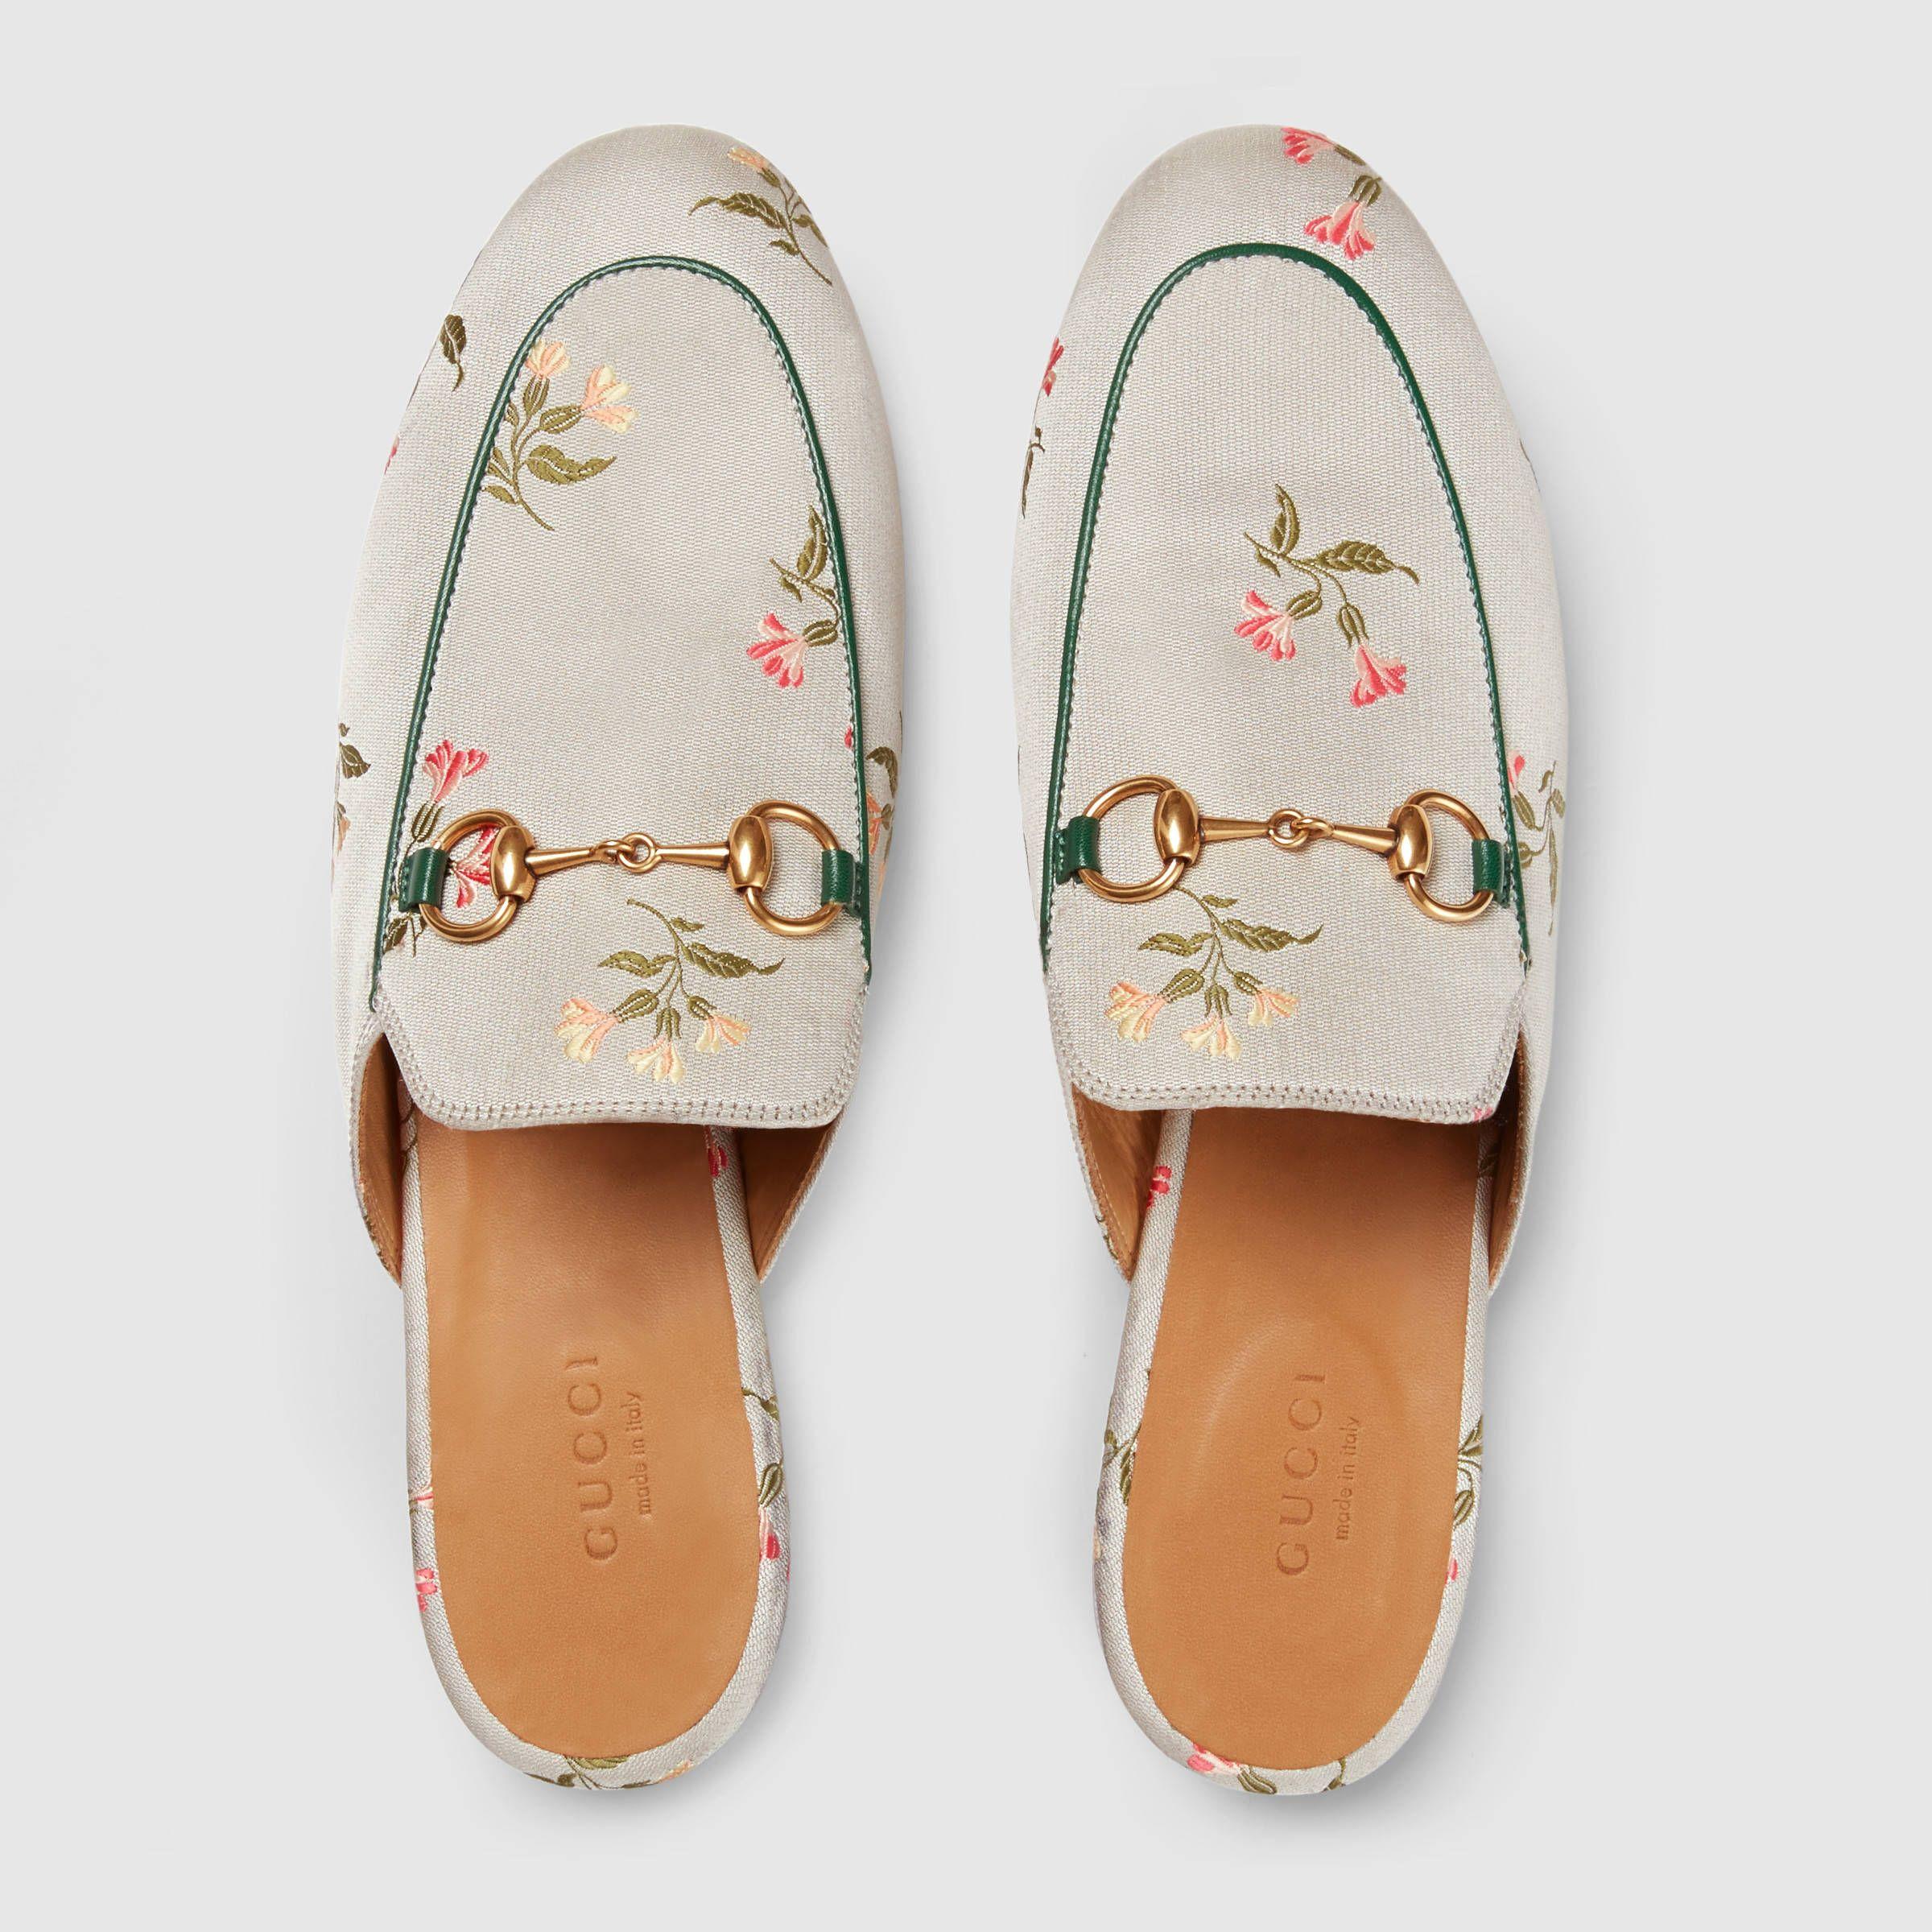 Gucci Princetown floral duchesse slipper